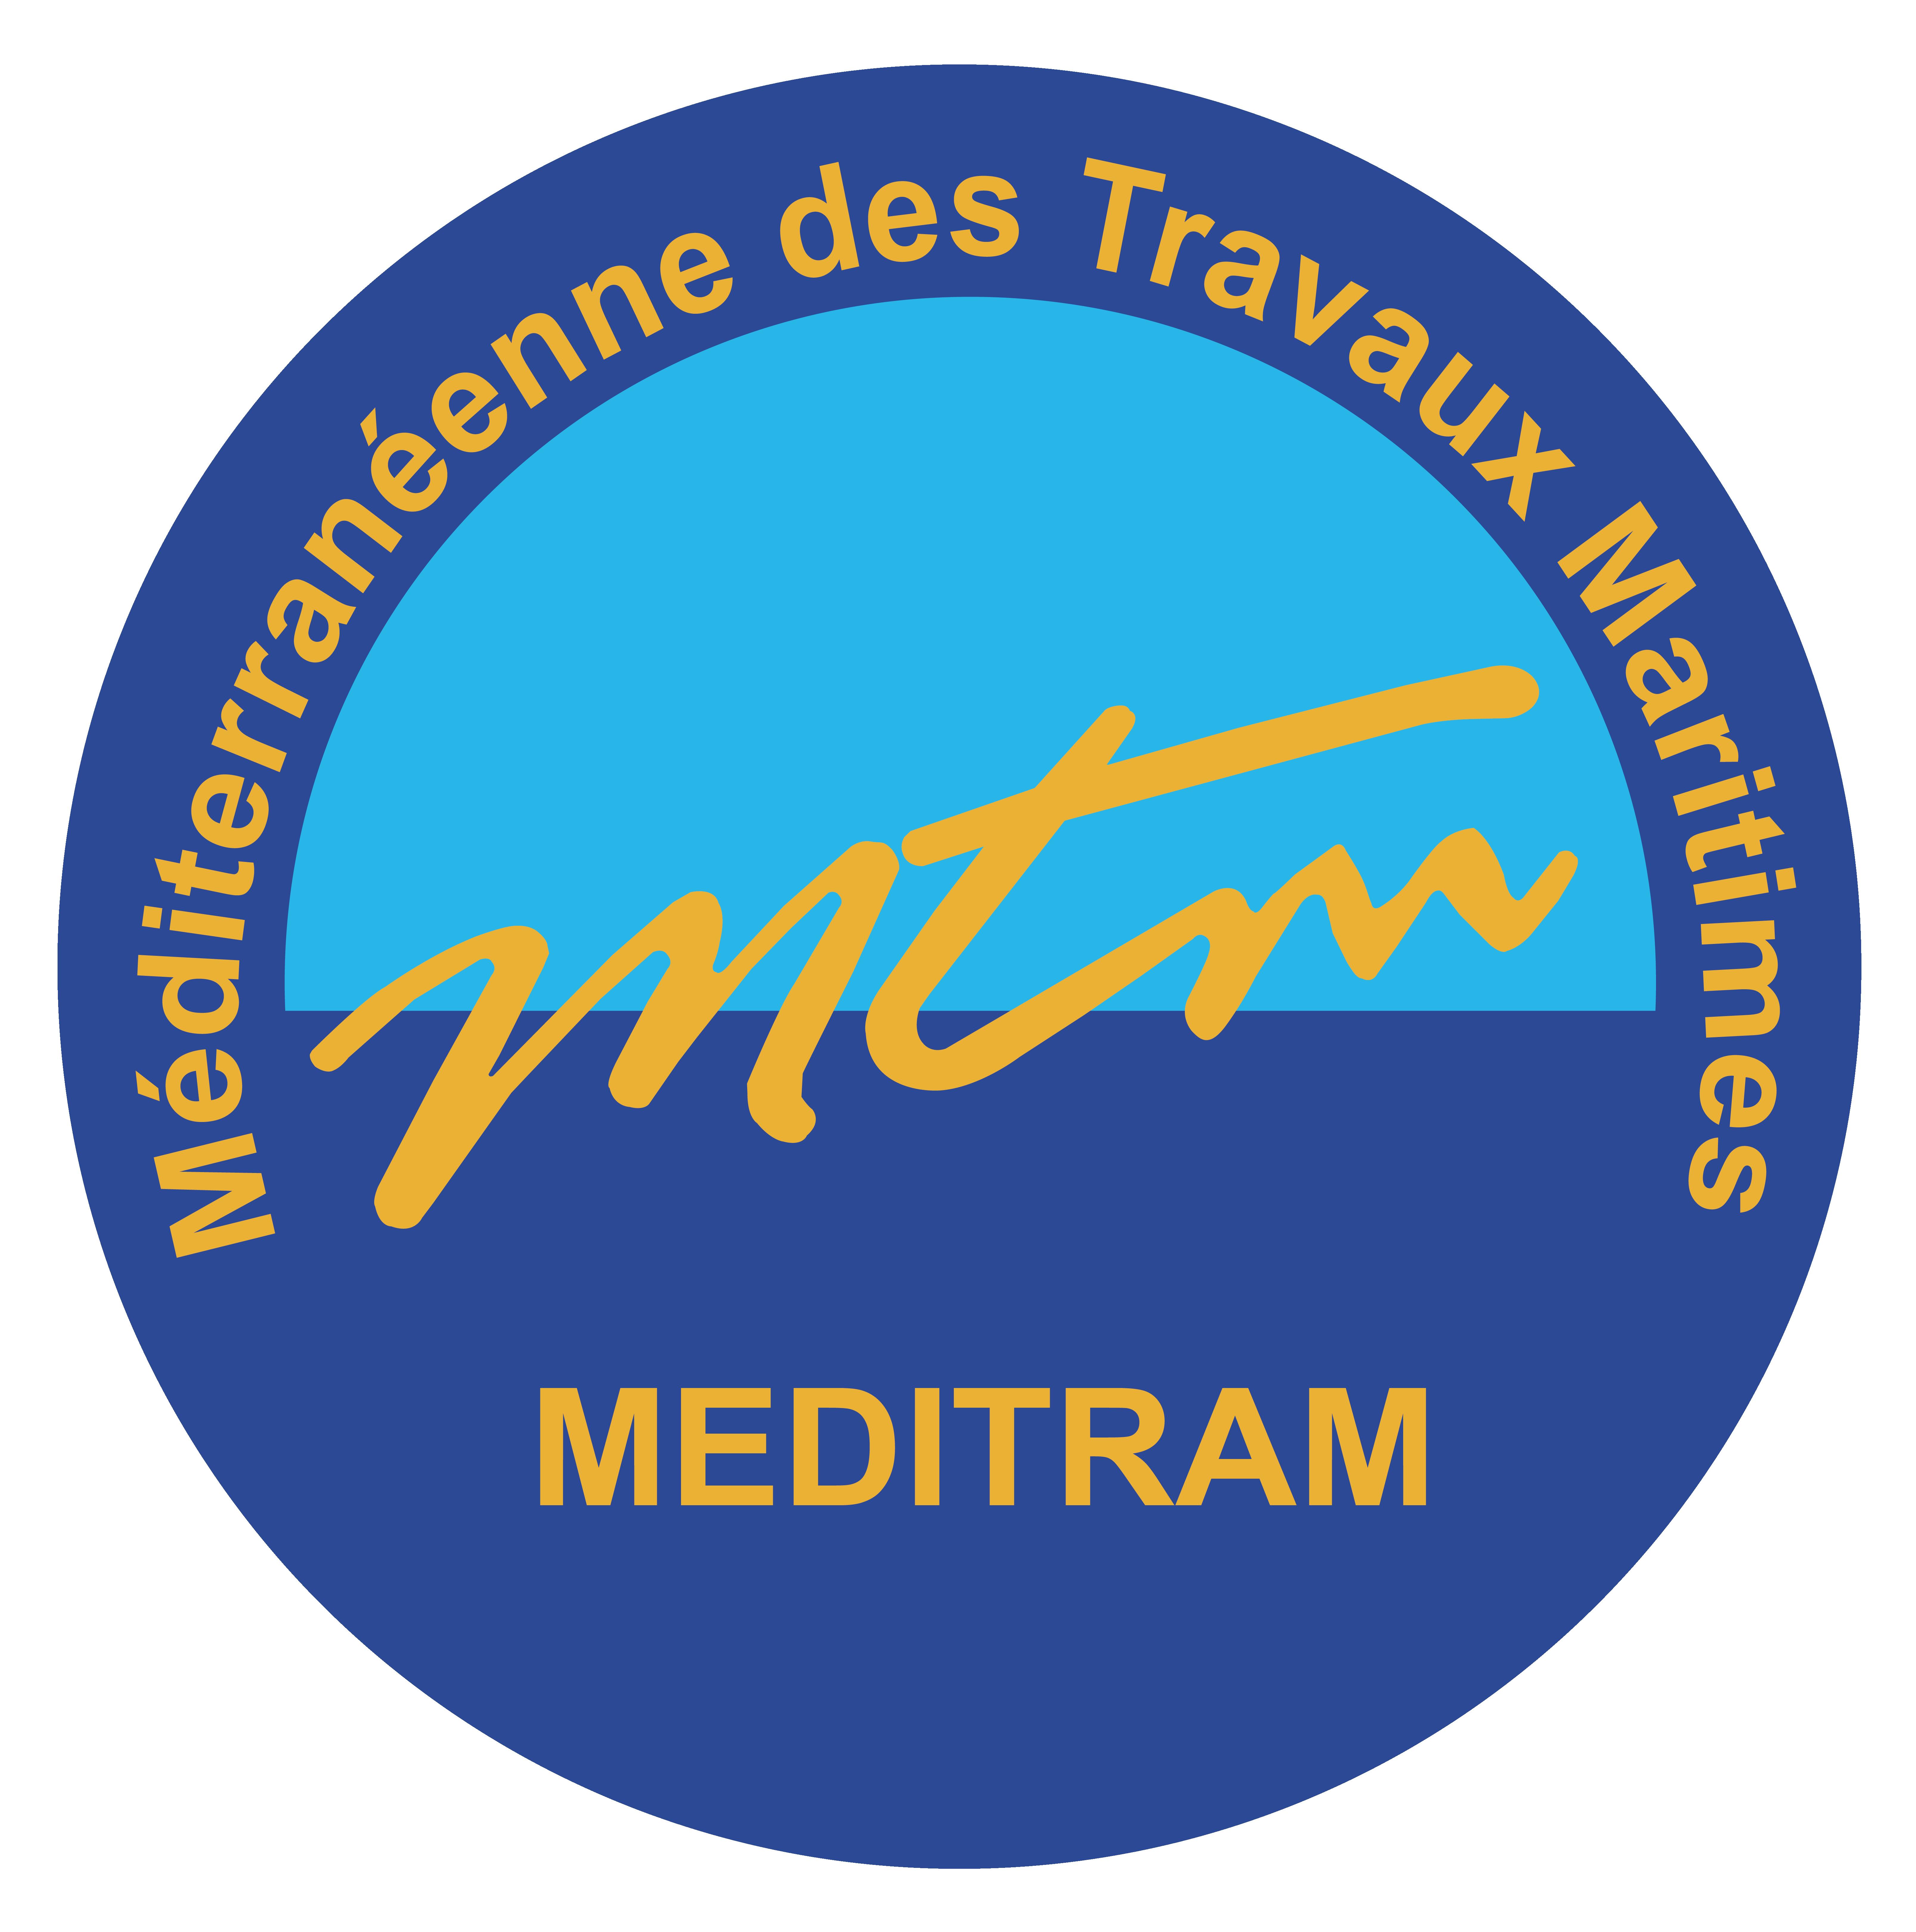 M-MEDITRAM